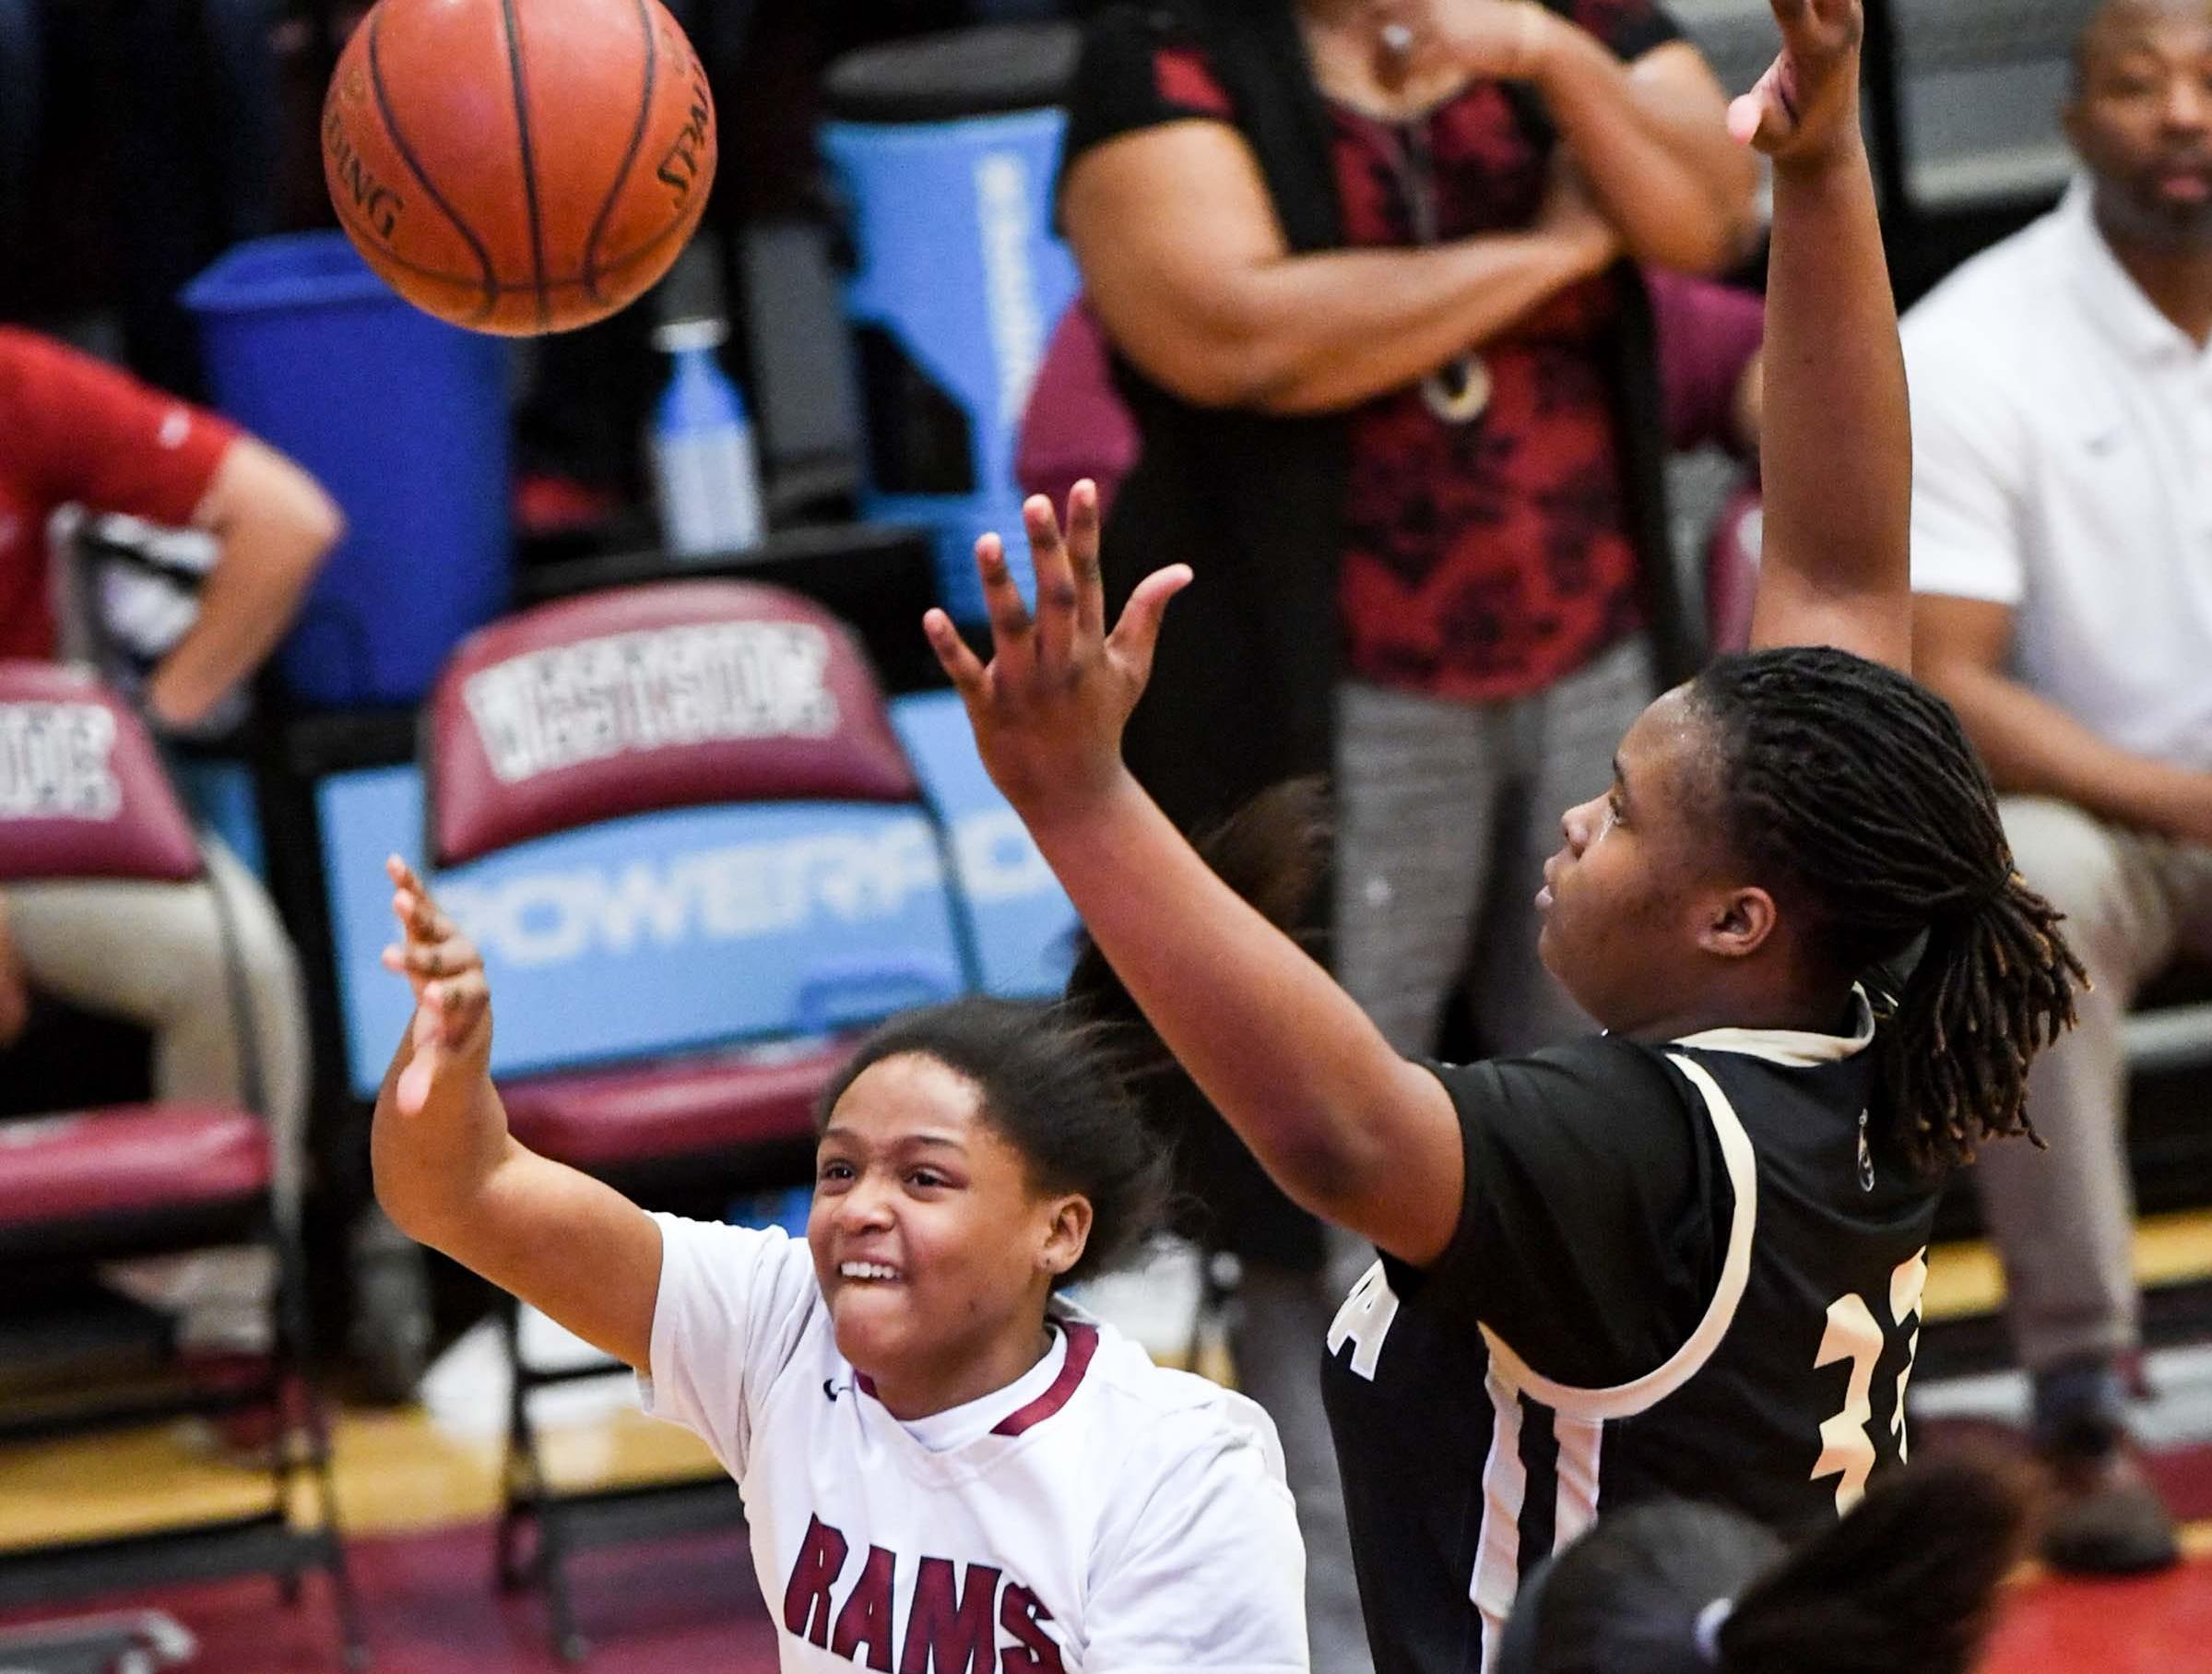 Westside freshman Keazia Hatten(23) shoots near TL Hanna freshman Dro Lee(33) during the fourth quarter at Westside High School in Anderson on Friday. Westside won 54-46.